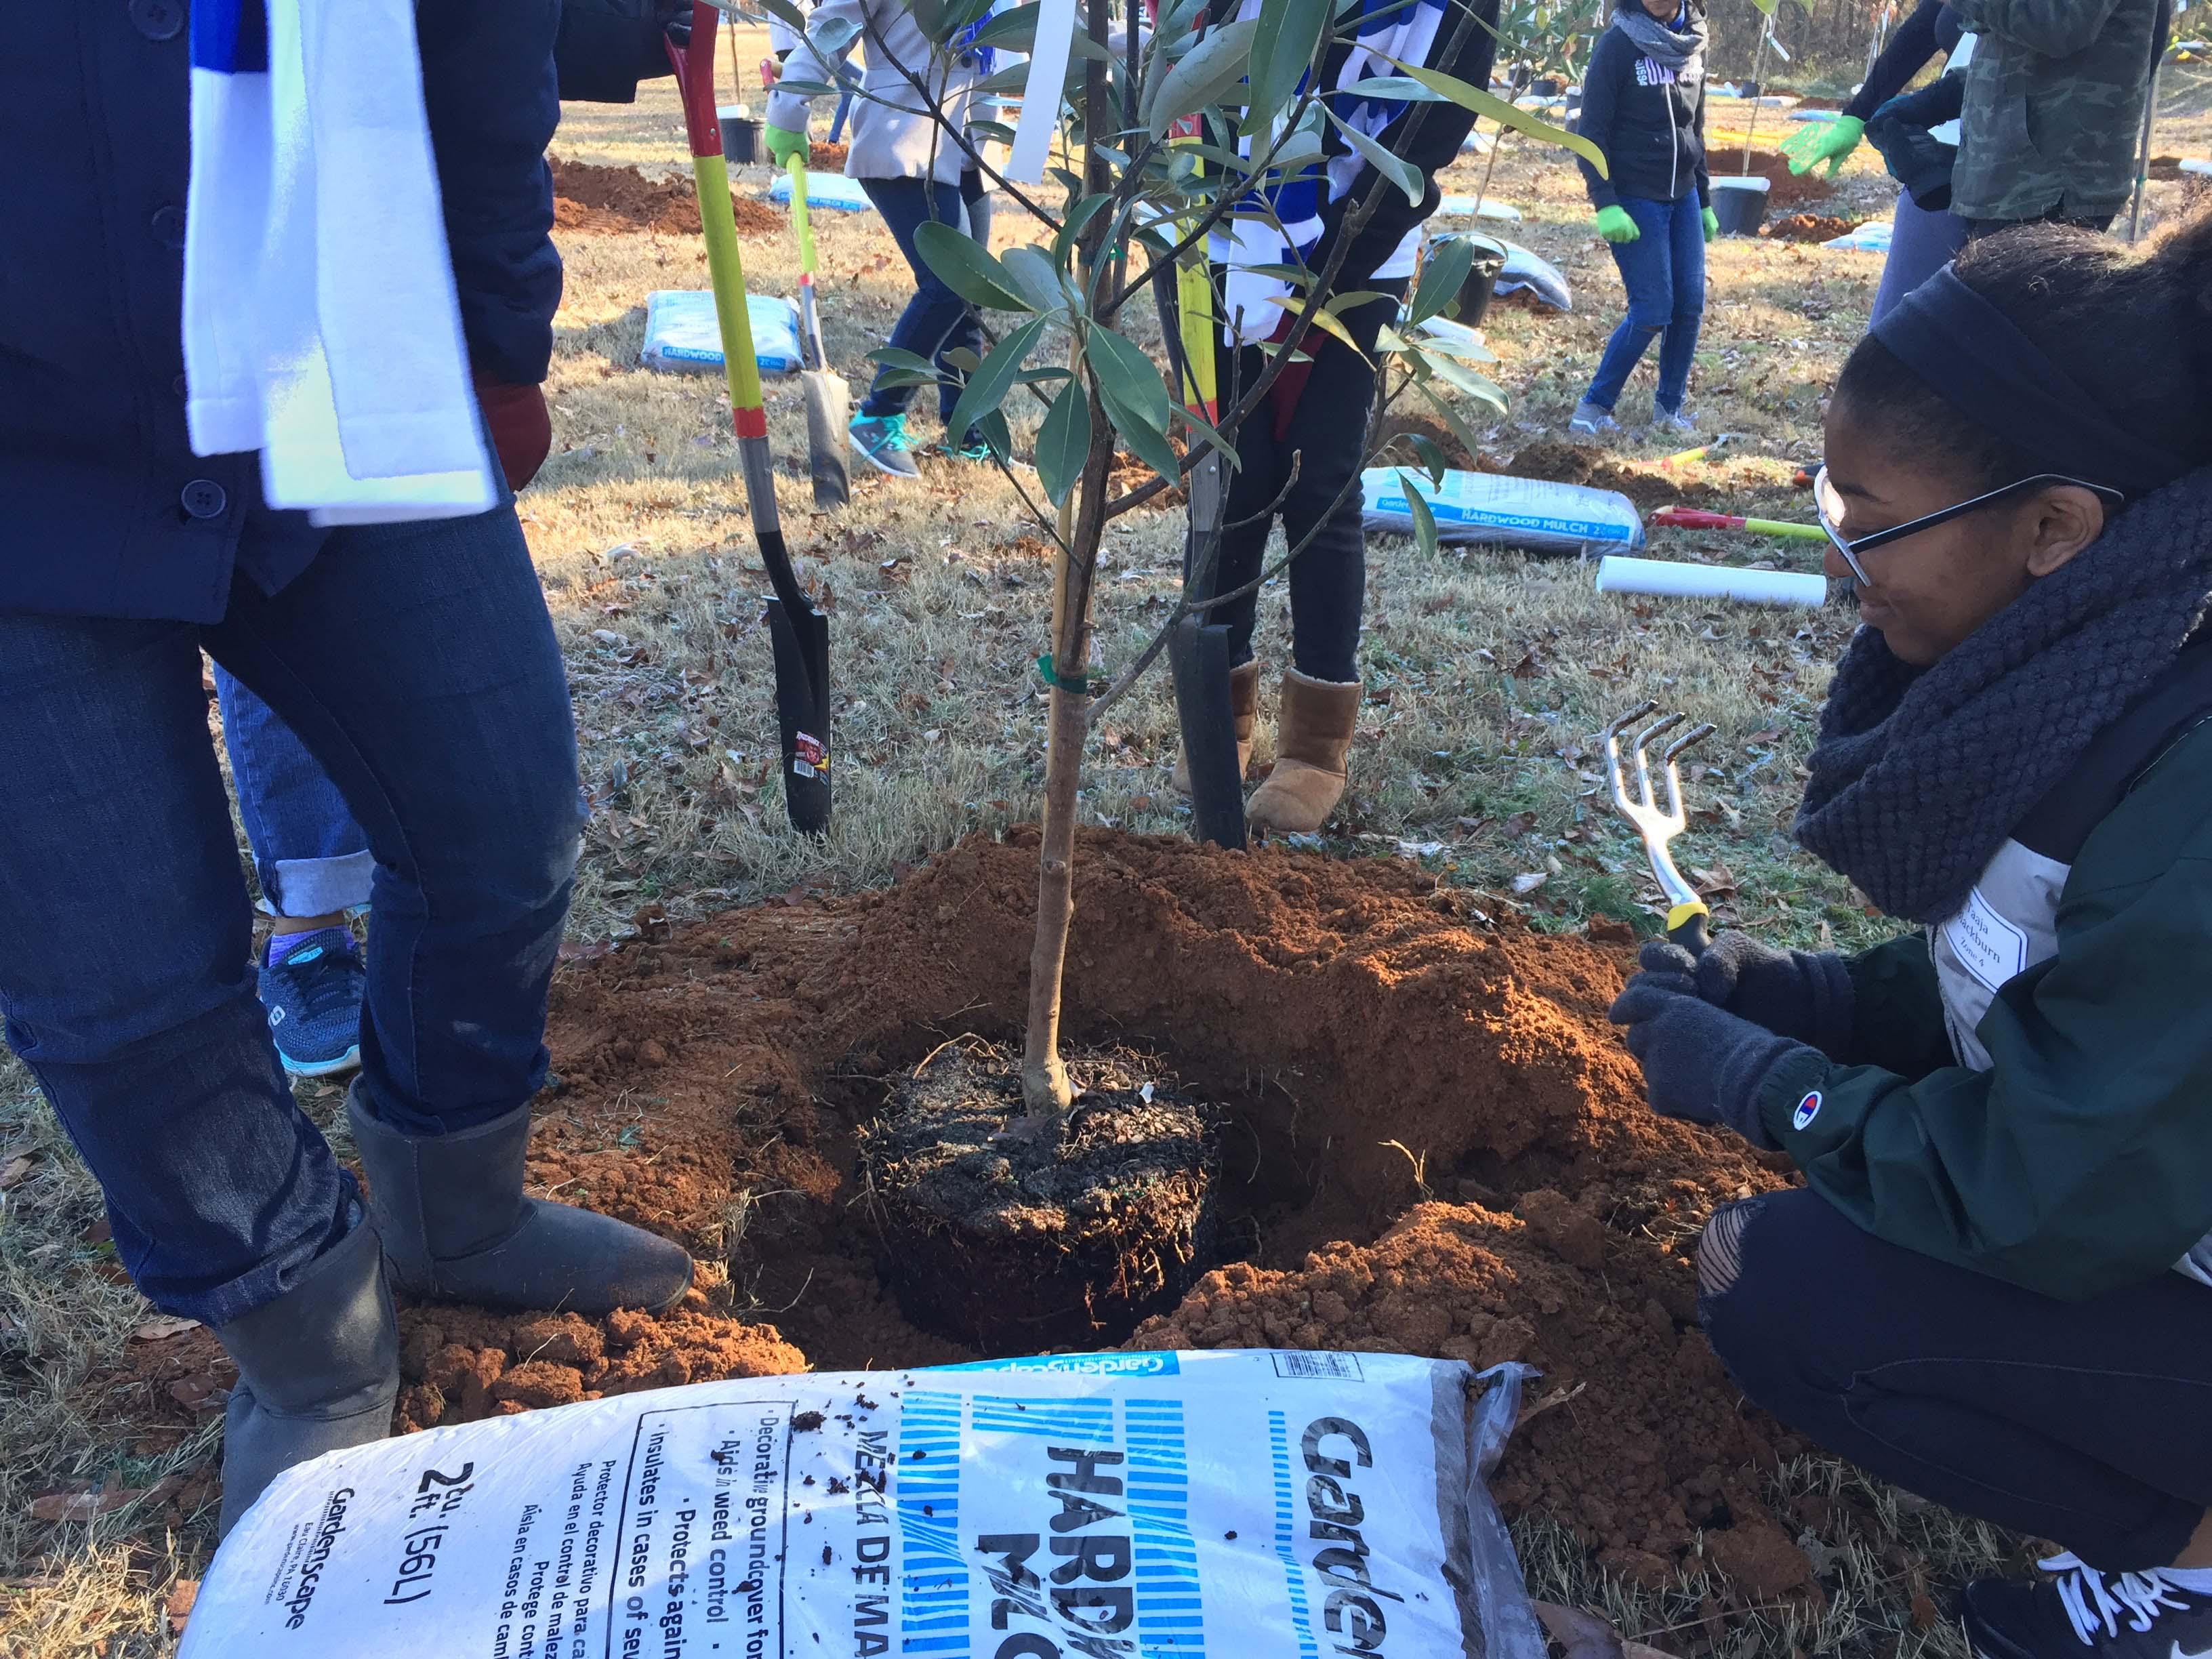 Hornets_Nest_Elementary_TreeDay_2016-12-10_7394